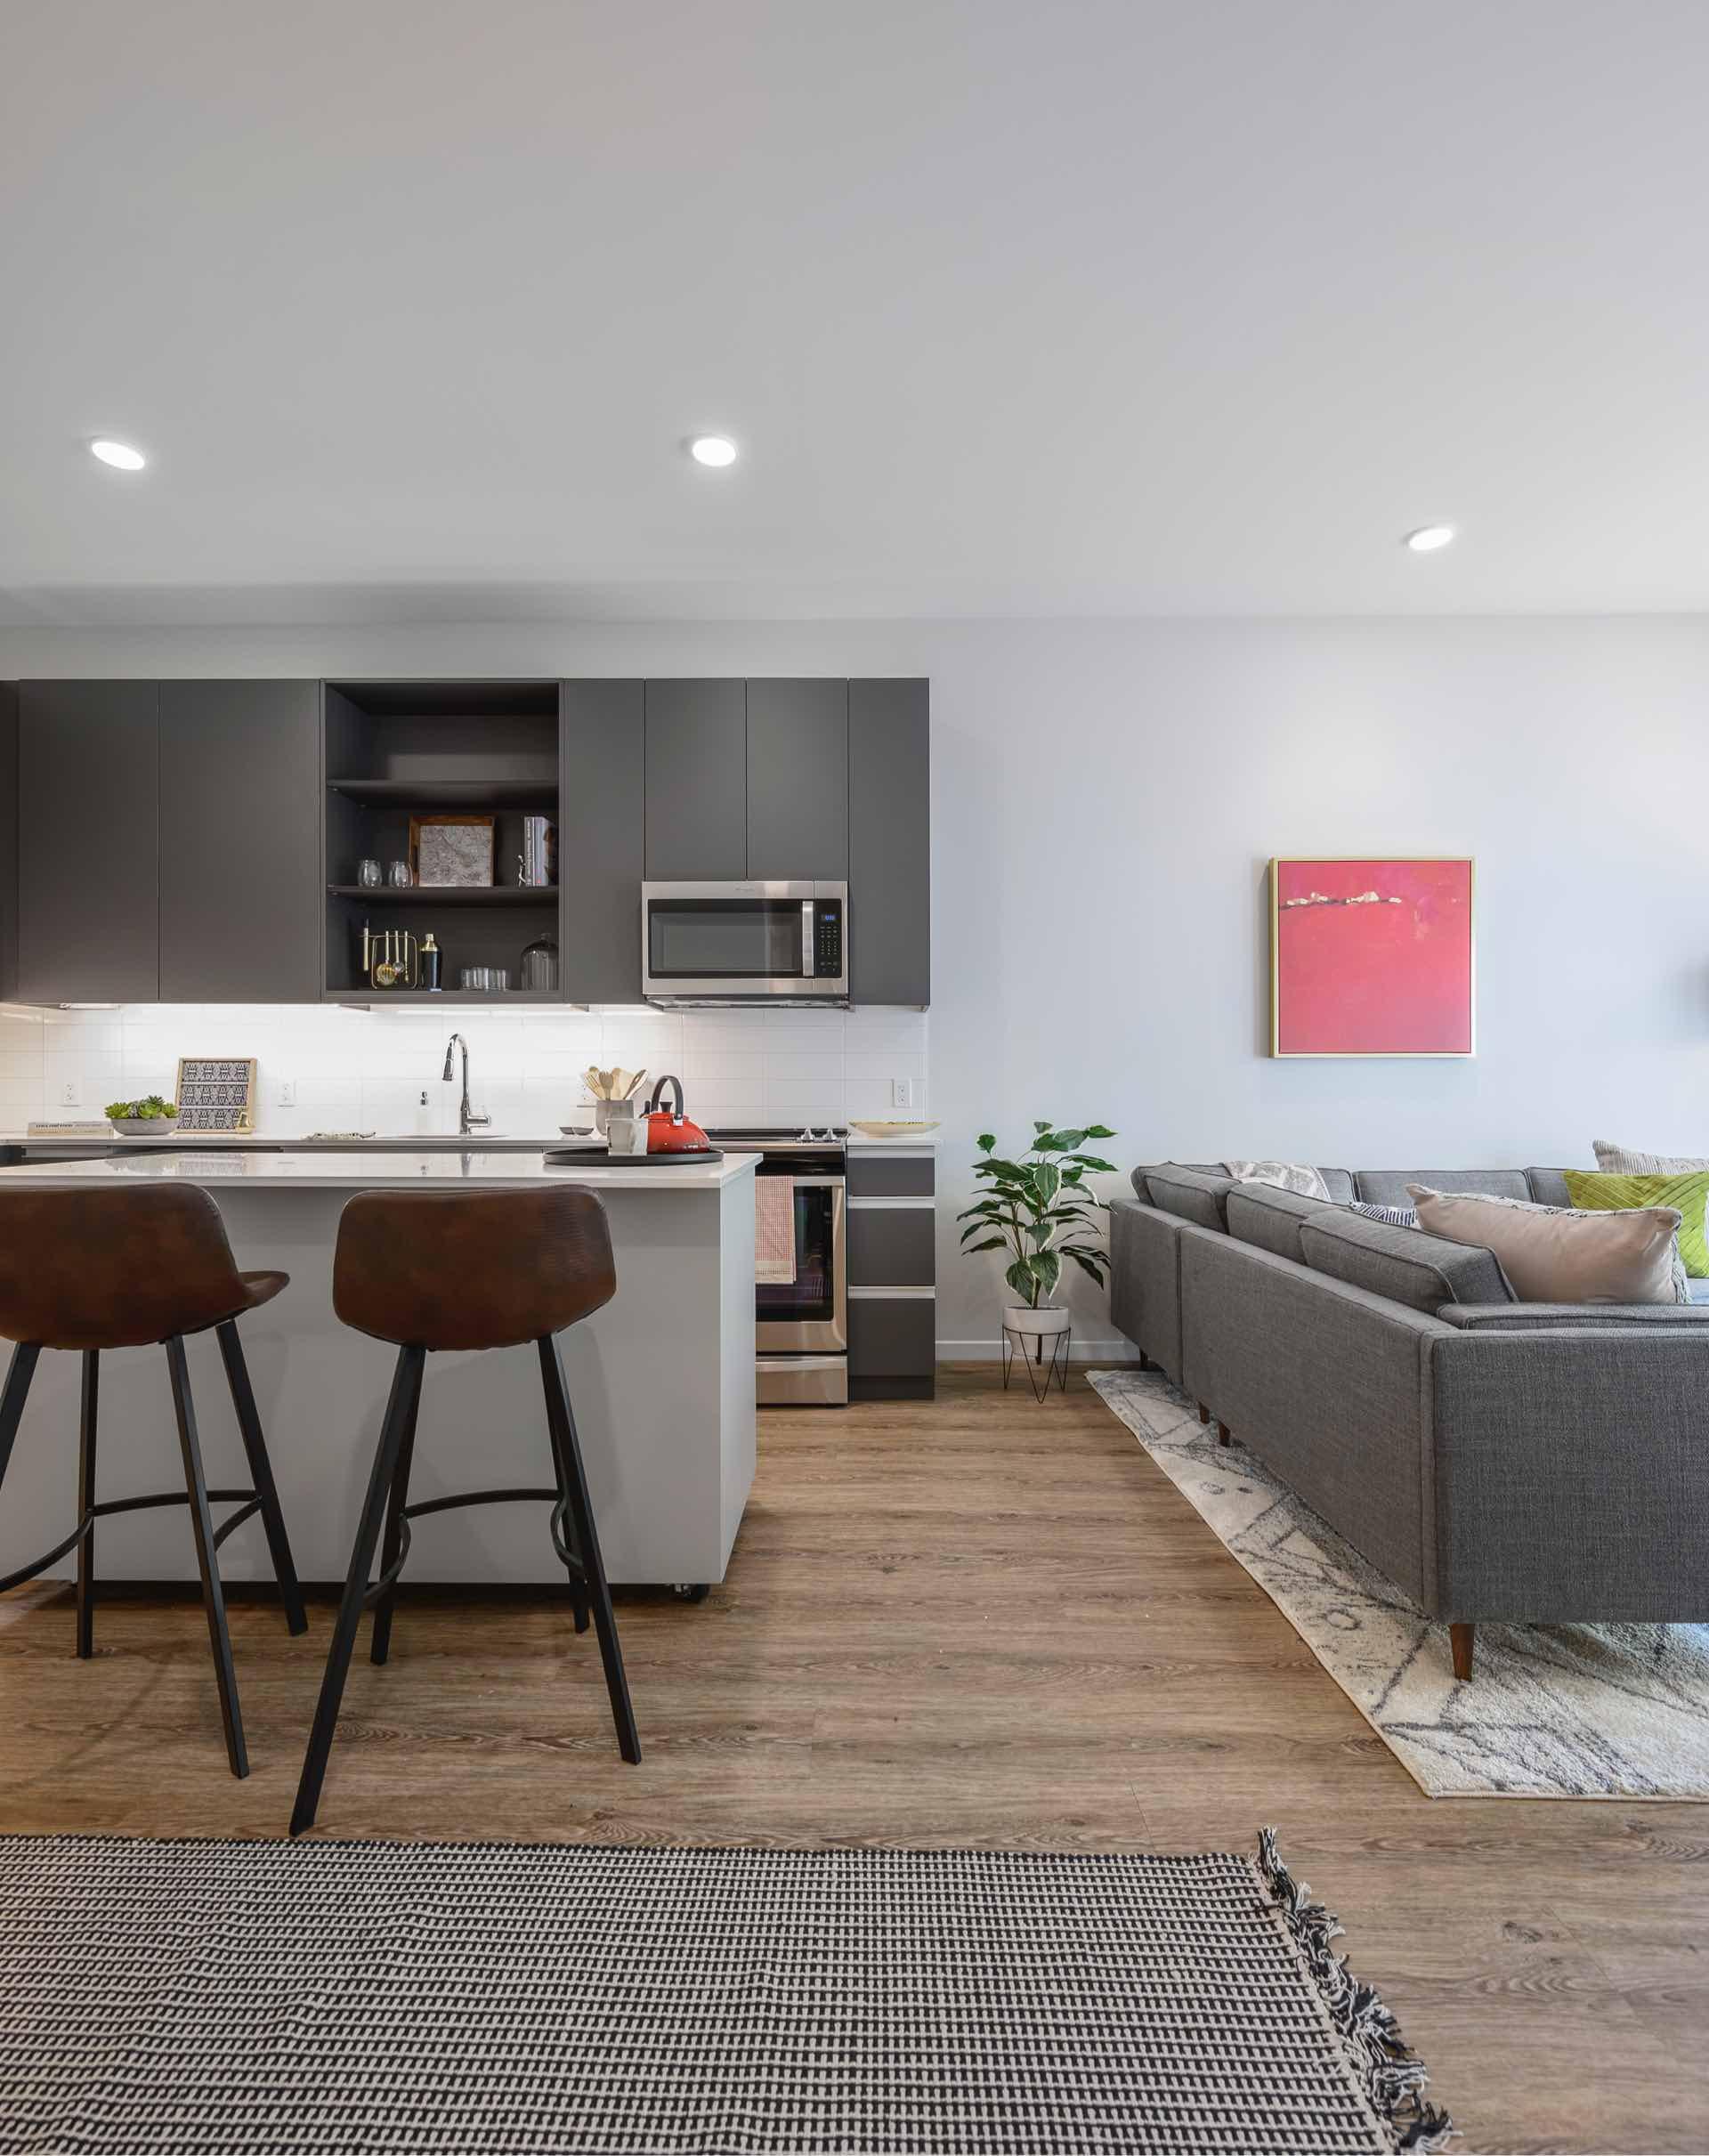 Apartments img 16